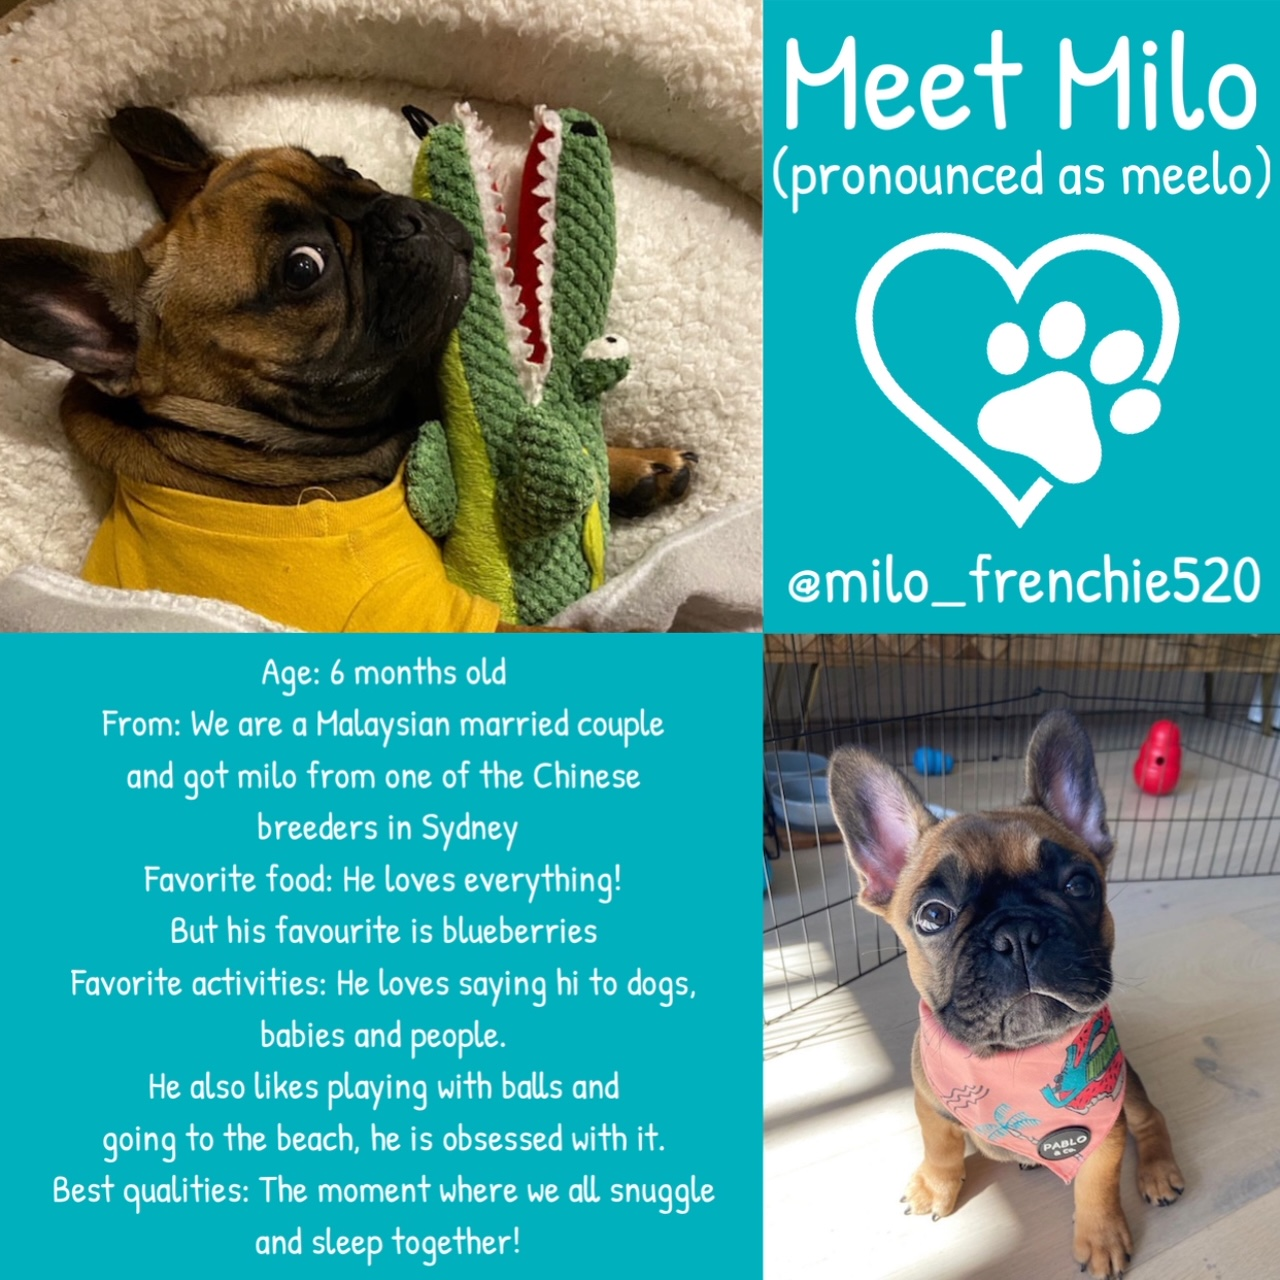 Milo the French Bulldog